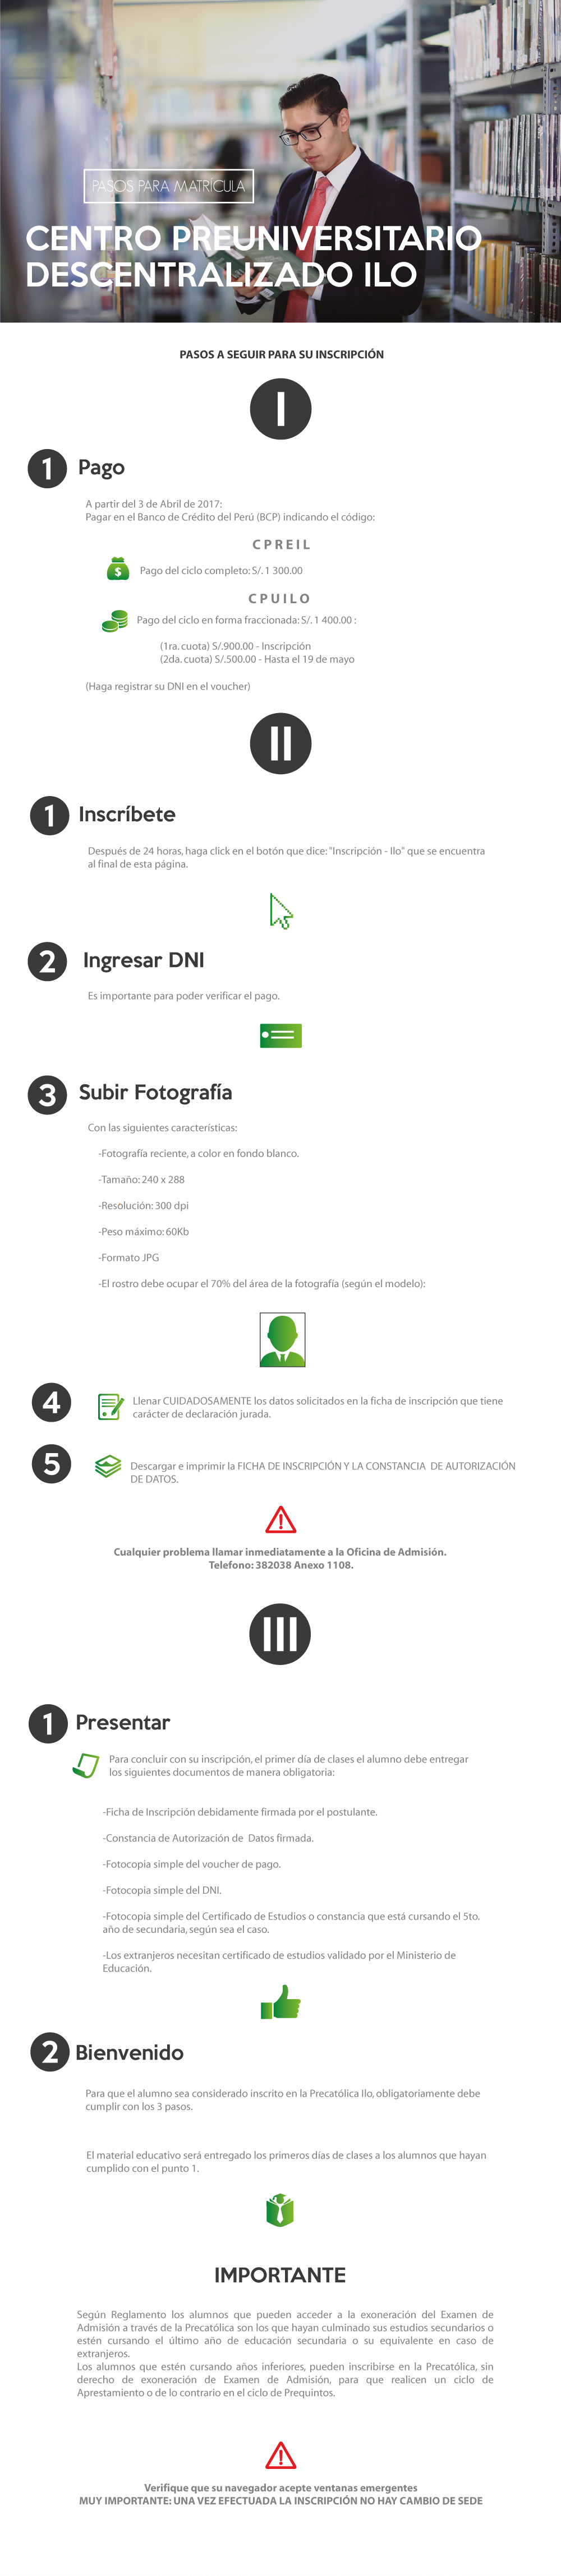 procesos-ucsm-ilo-2